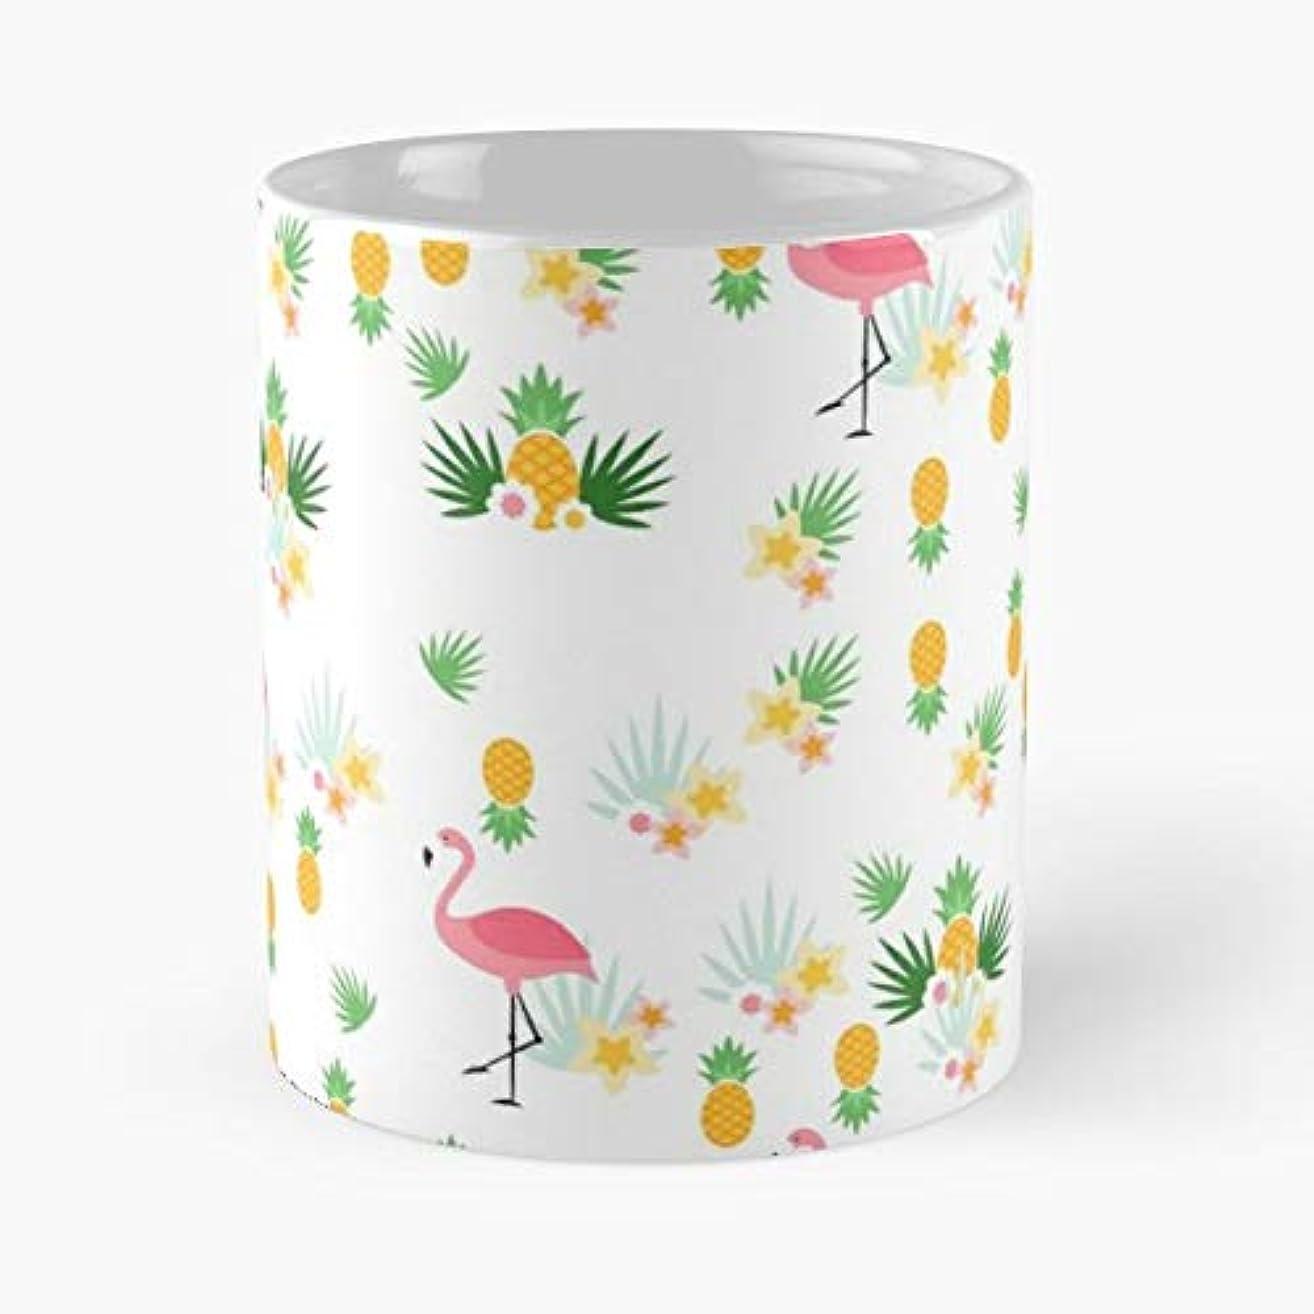 Tropical Flamingo Pineapple Pineapples - Morning Coffee Mug Ceramic Best Gift